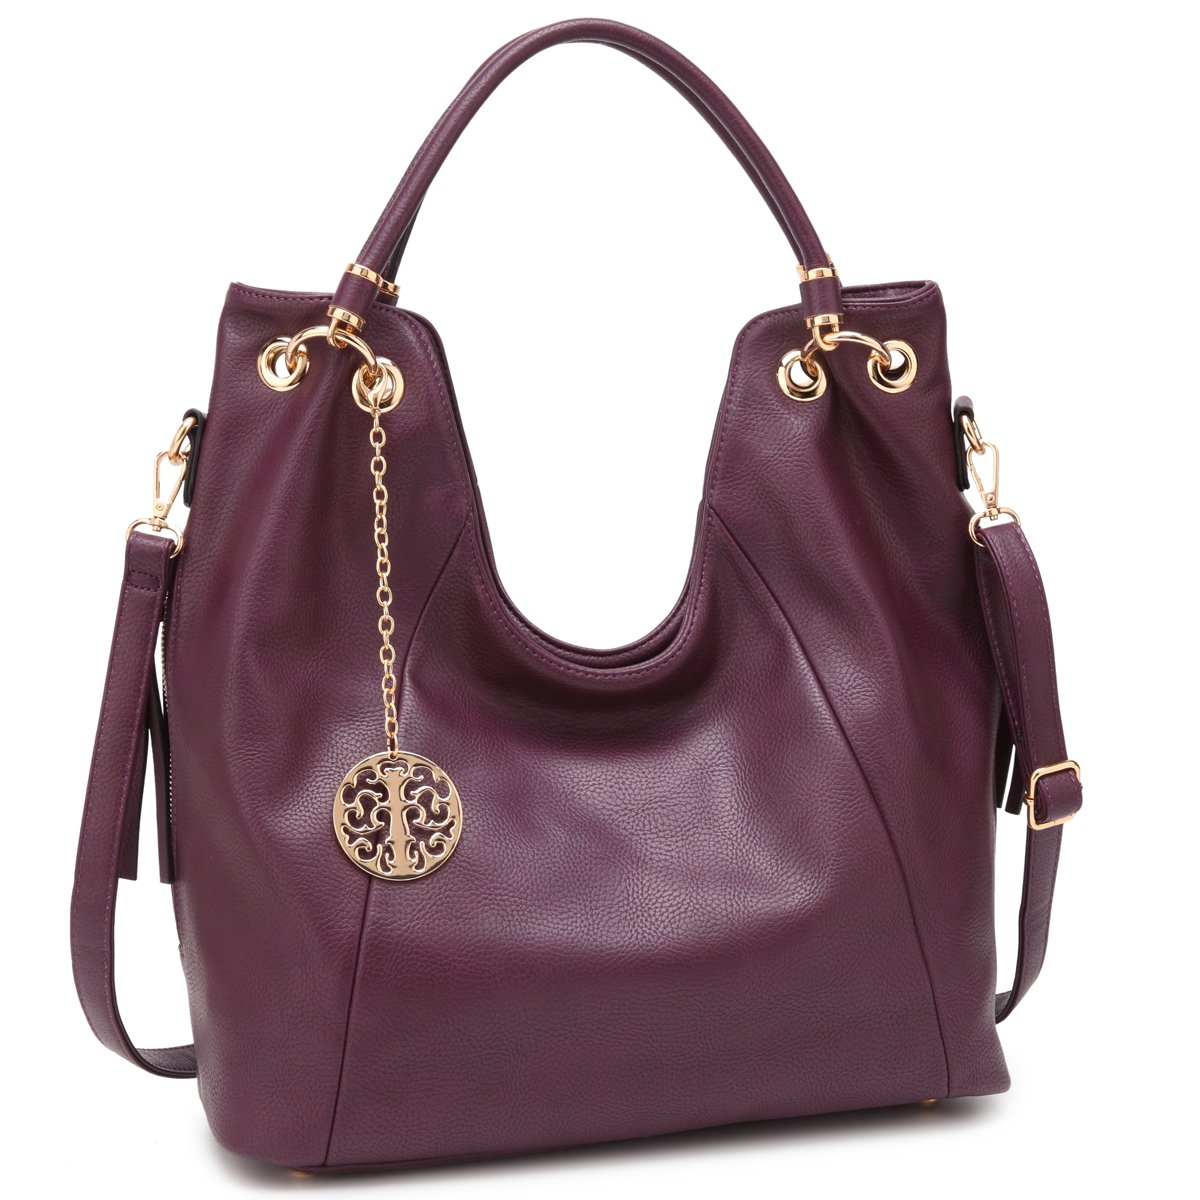 Shoulder Hobo Bag Top Zip Purse Fashion Vegan Handbag w/Long Strap Side Zipper Pockets Purple